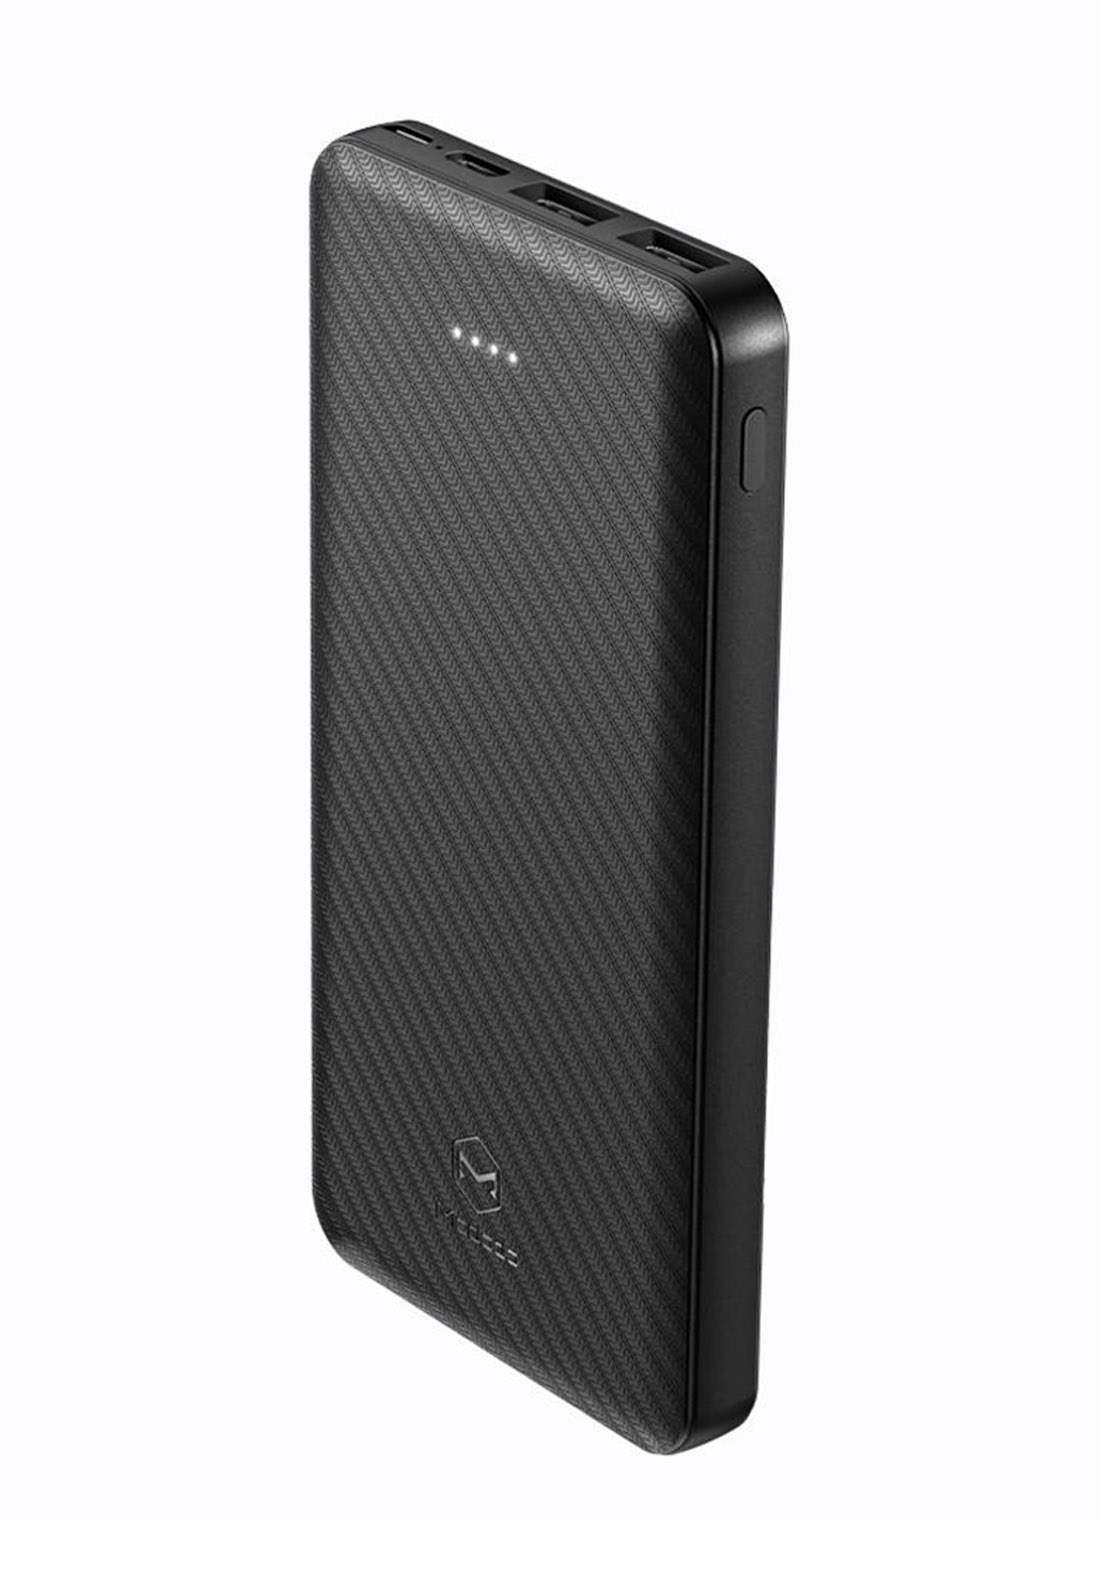 (3223)Mcdodo MC07351 Dual USB Power Bank 10000mAh - Black شاحن  محمول